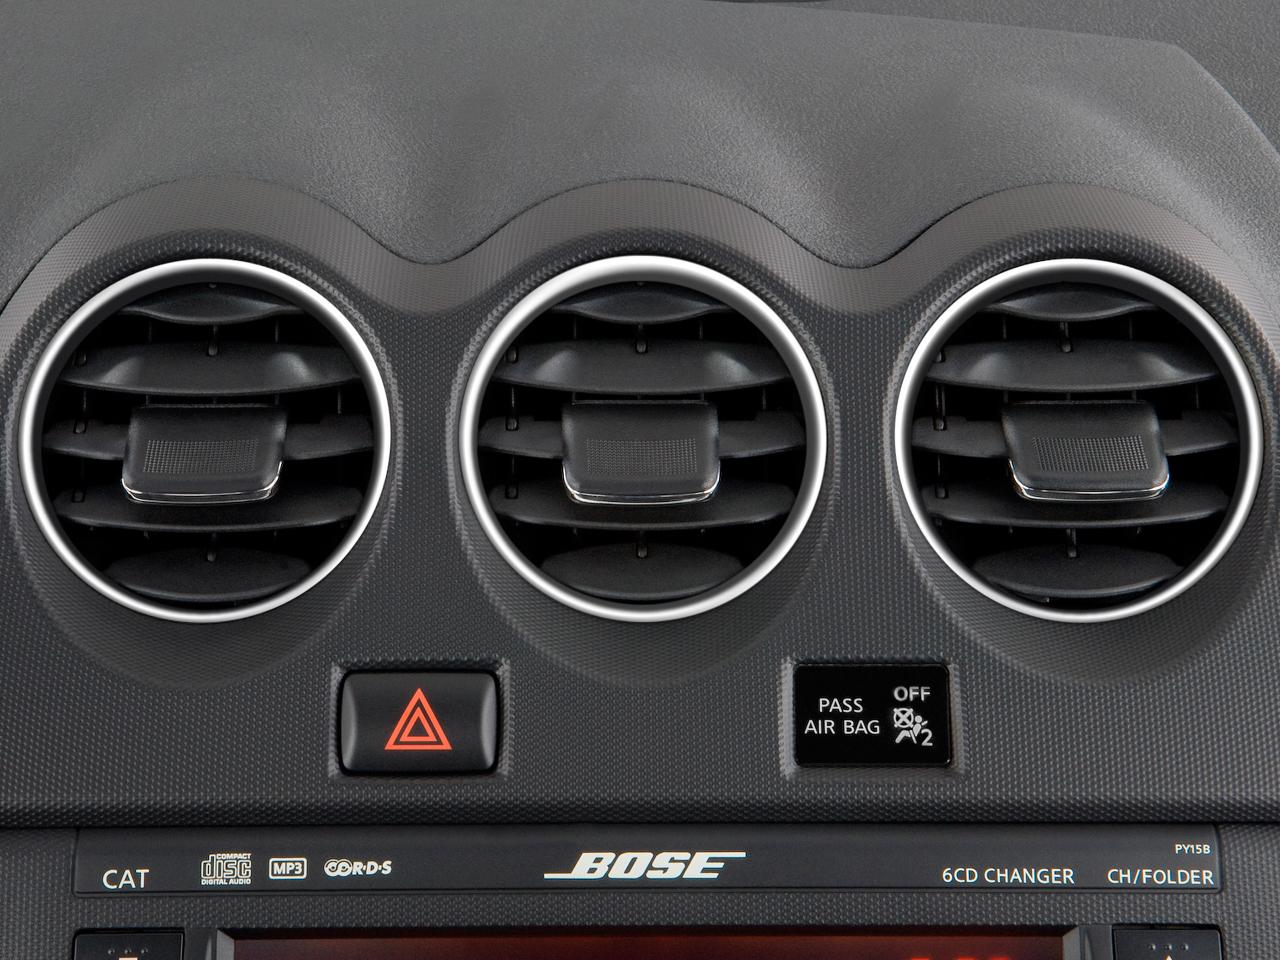 2009 Nissan Altima Coupe - New Nissan Midsize Coupe Review - Automobile Magazine